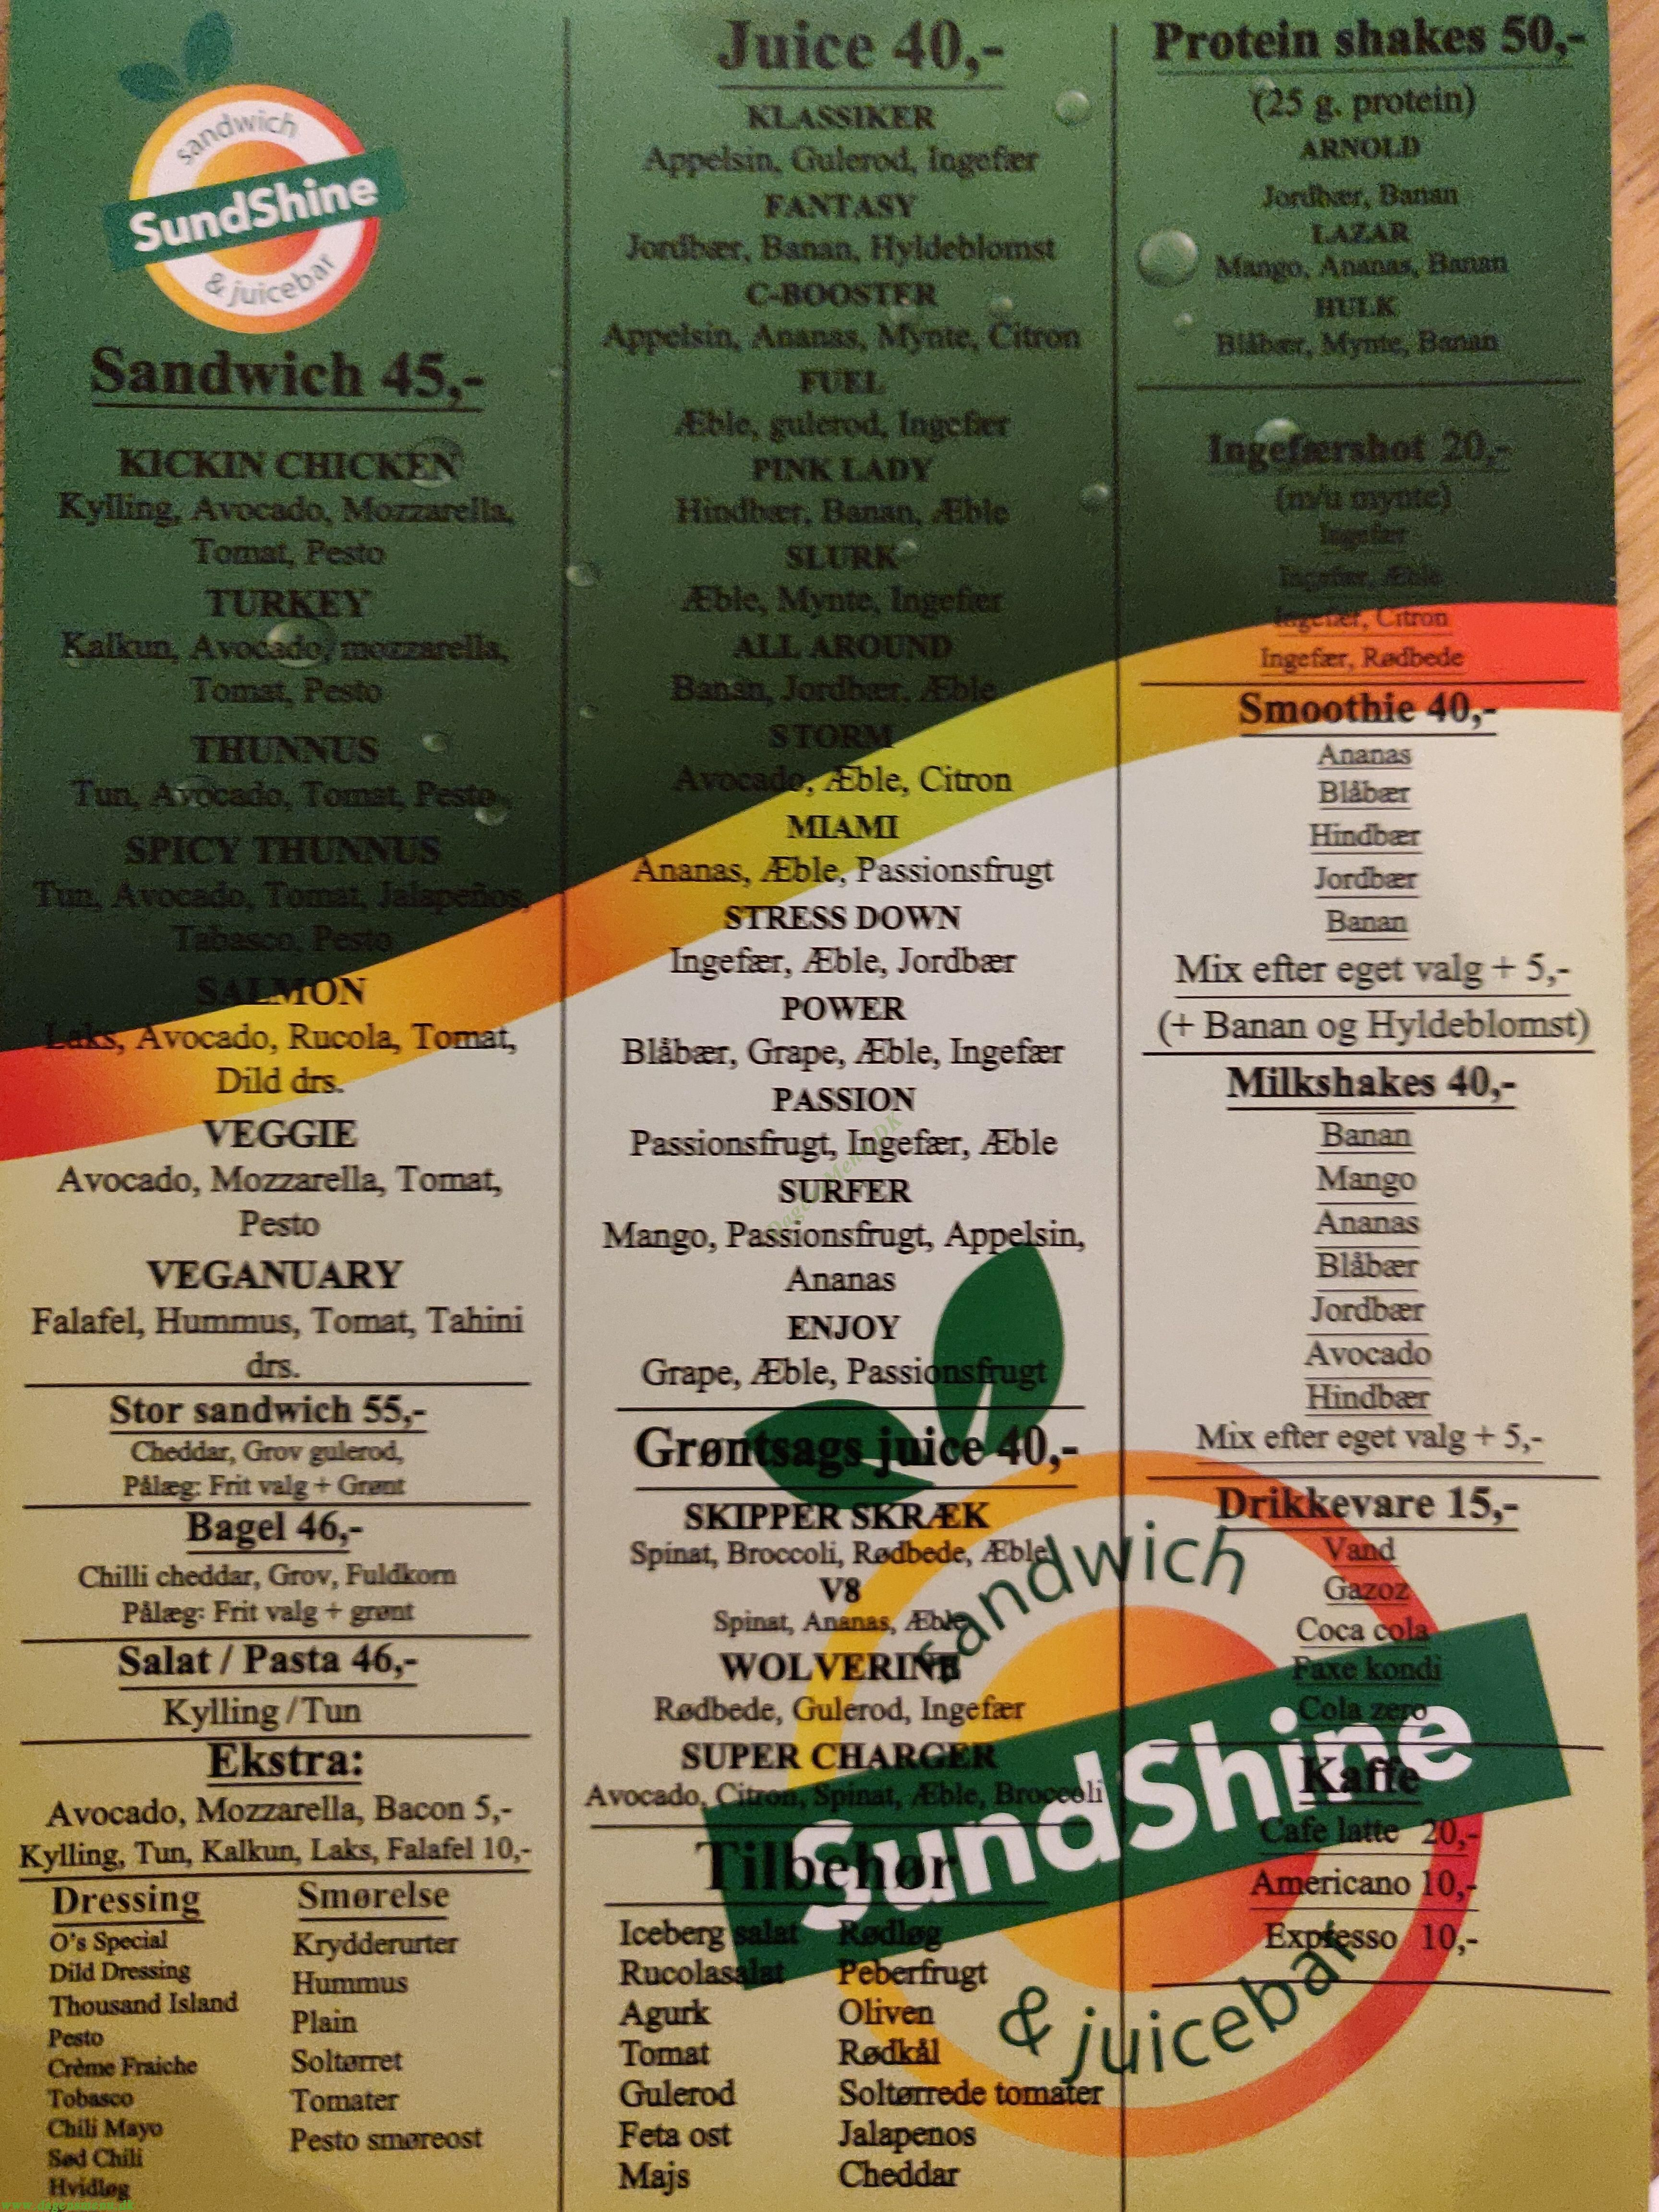 SundShine sandwich & juicebar - Menukort